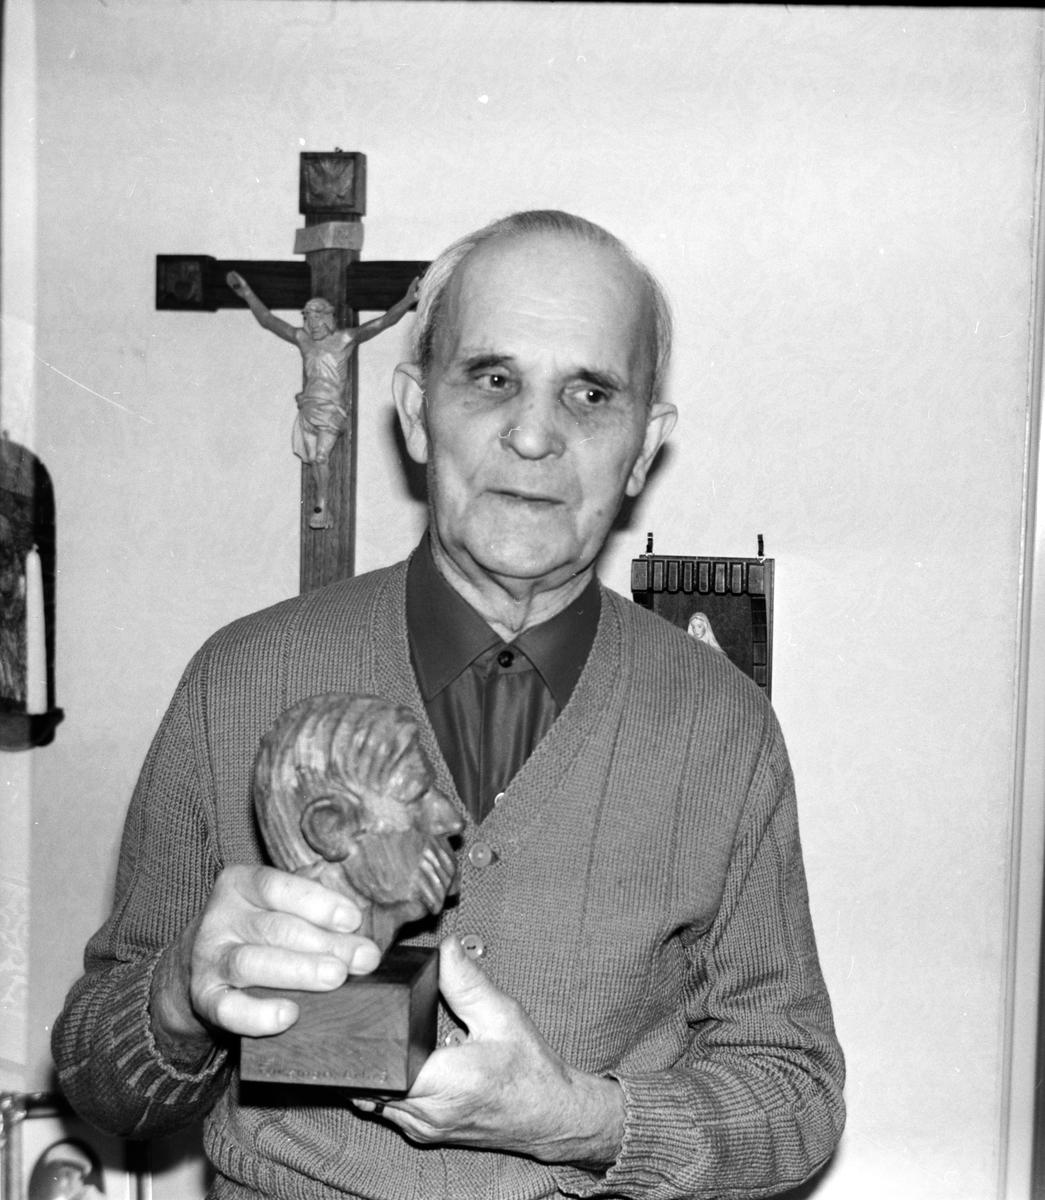 Arbrå, Julius Forsman, 2 December 1968